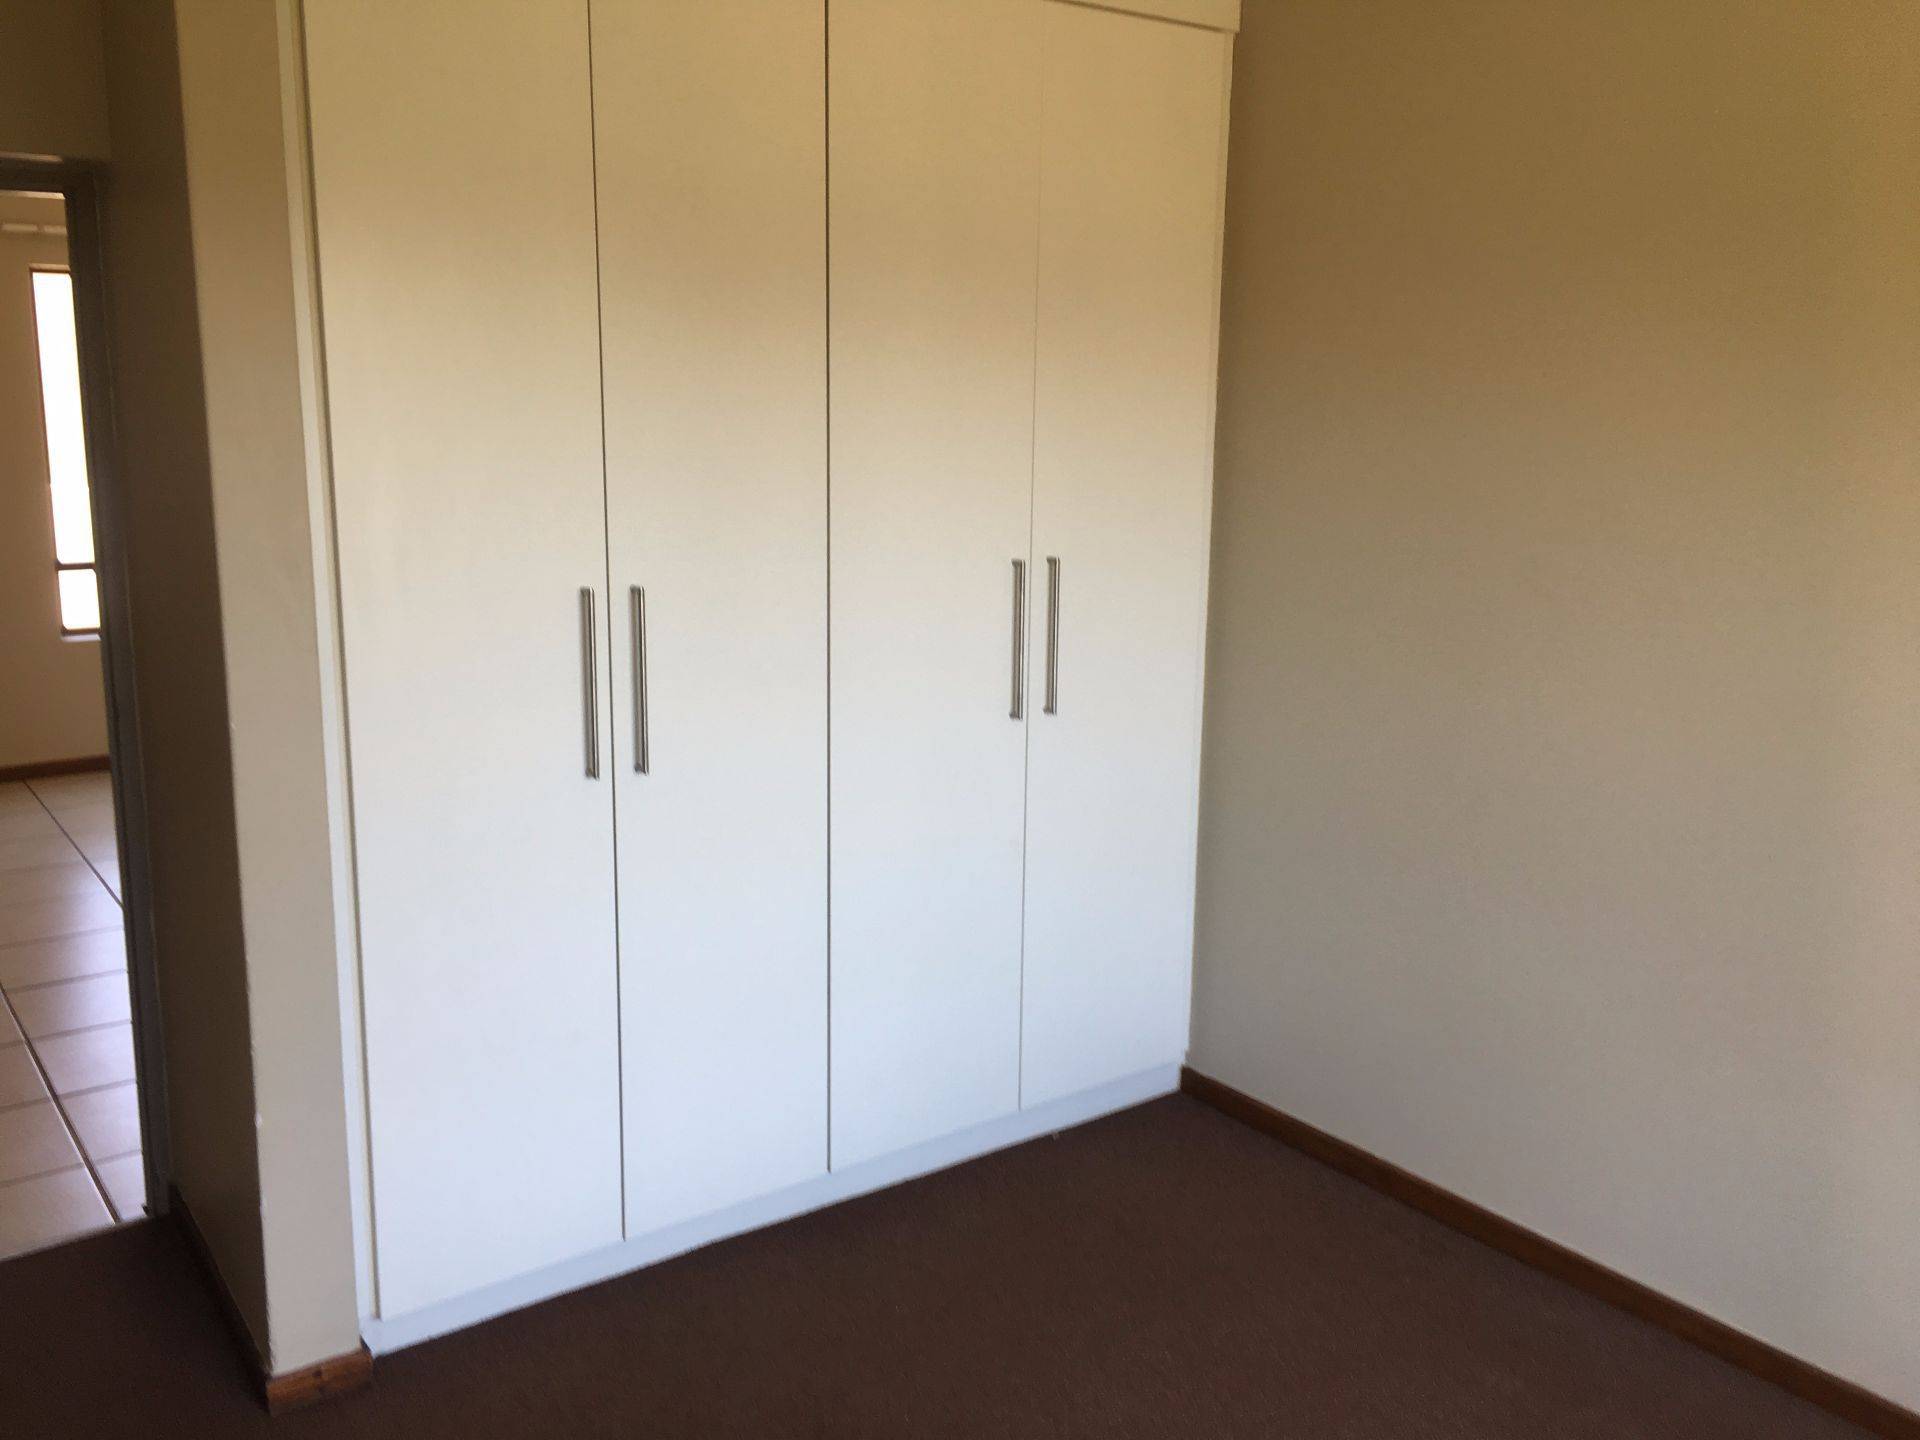 Broadacres property for sale. Ref No: 13552745. Picture no 8